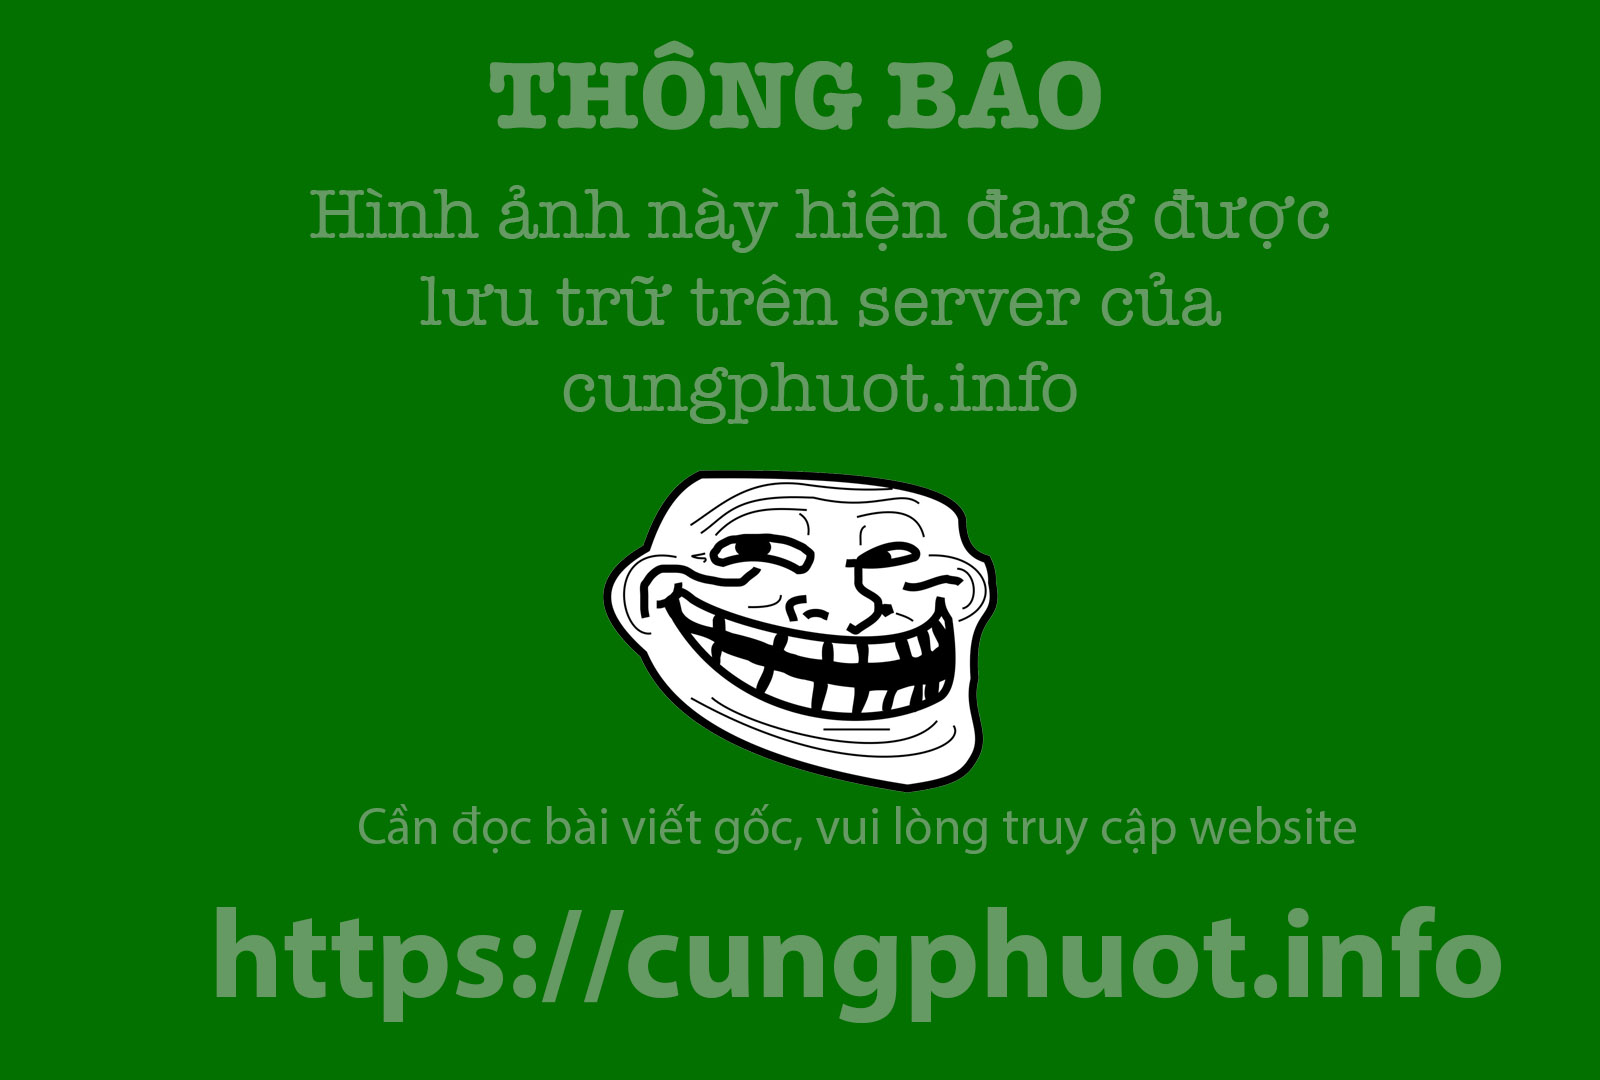 Binh minh tuyet dep tren nhung doi che Tan Cuong hinh anh 1